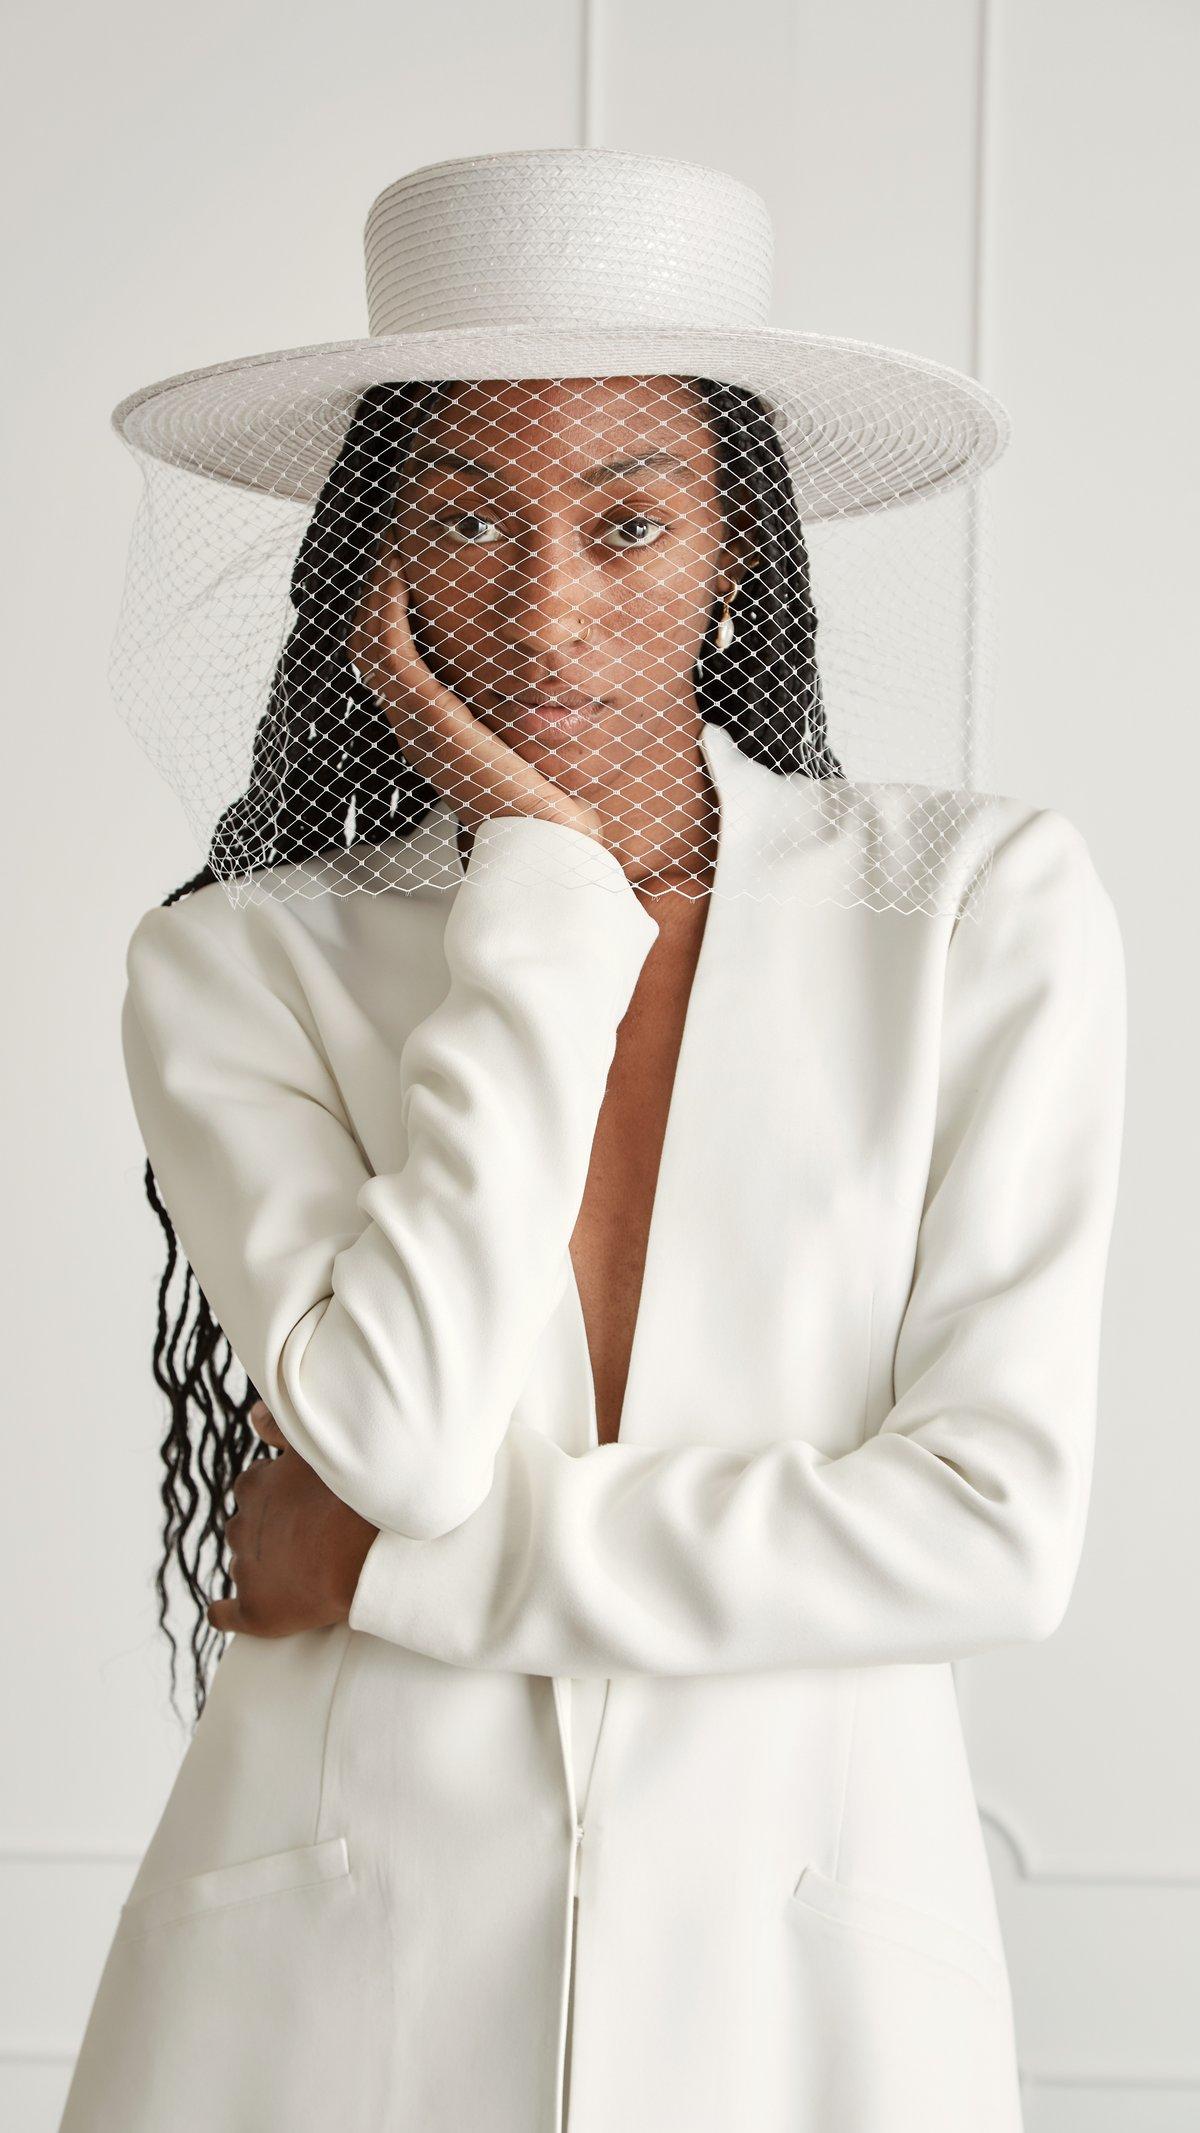 loho-bride-hair-accessories-hat-veil